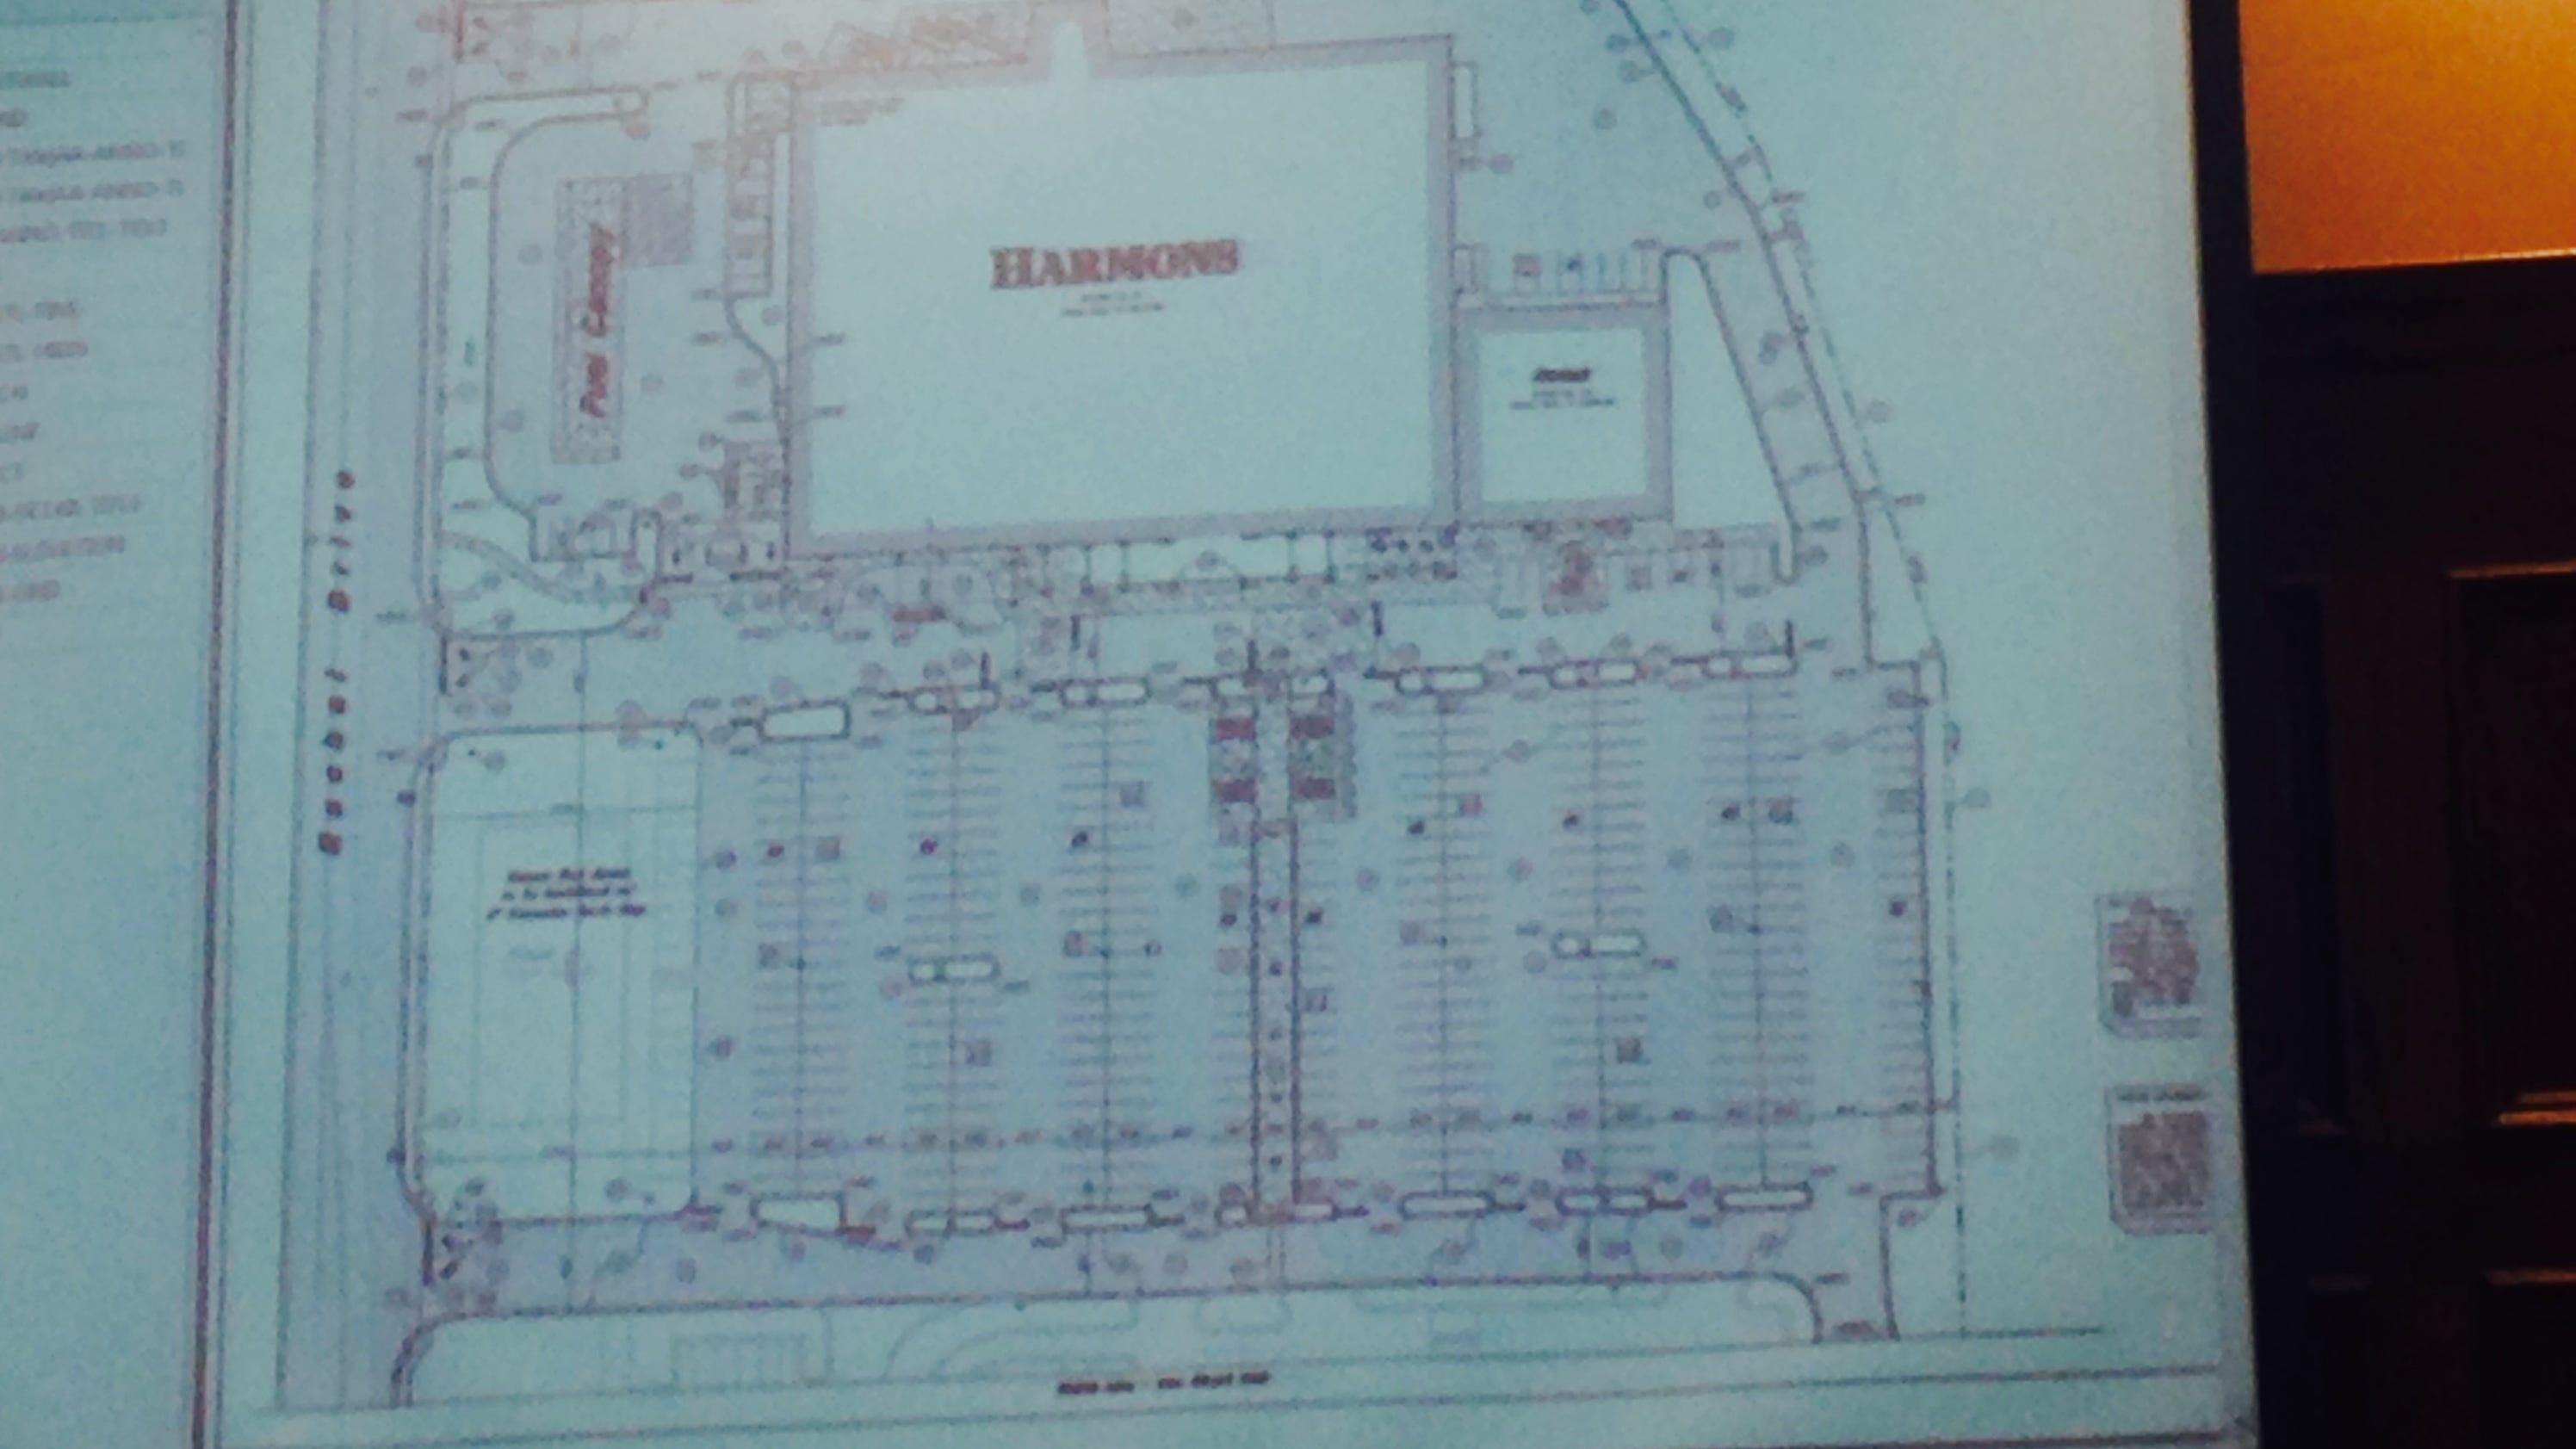 Santa Clara Oks Plan For New Harmons Store